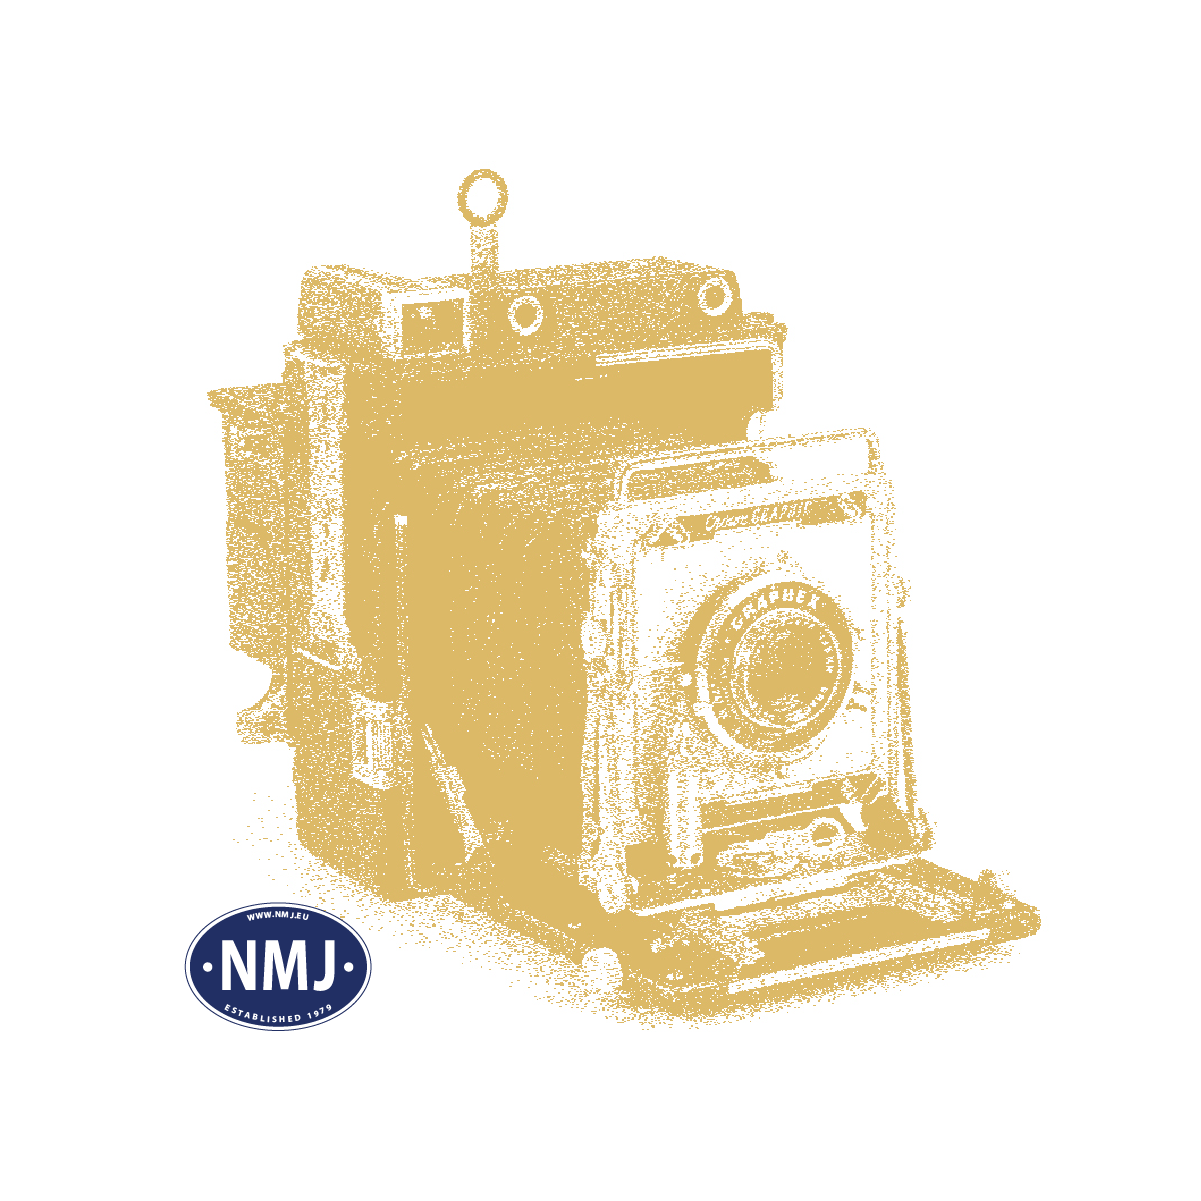 NMJT502.105 - NMJ Topline Kbps 21 76 335 3 806-1 Rungenwagen der NSB